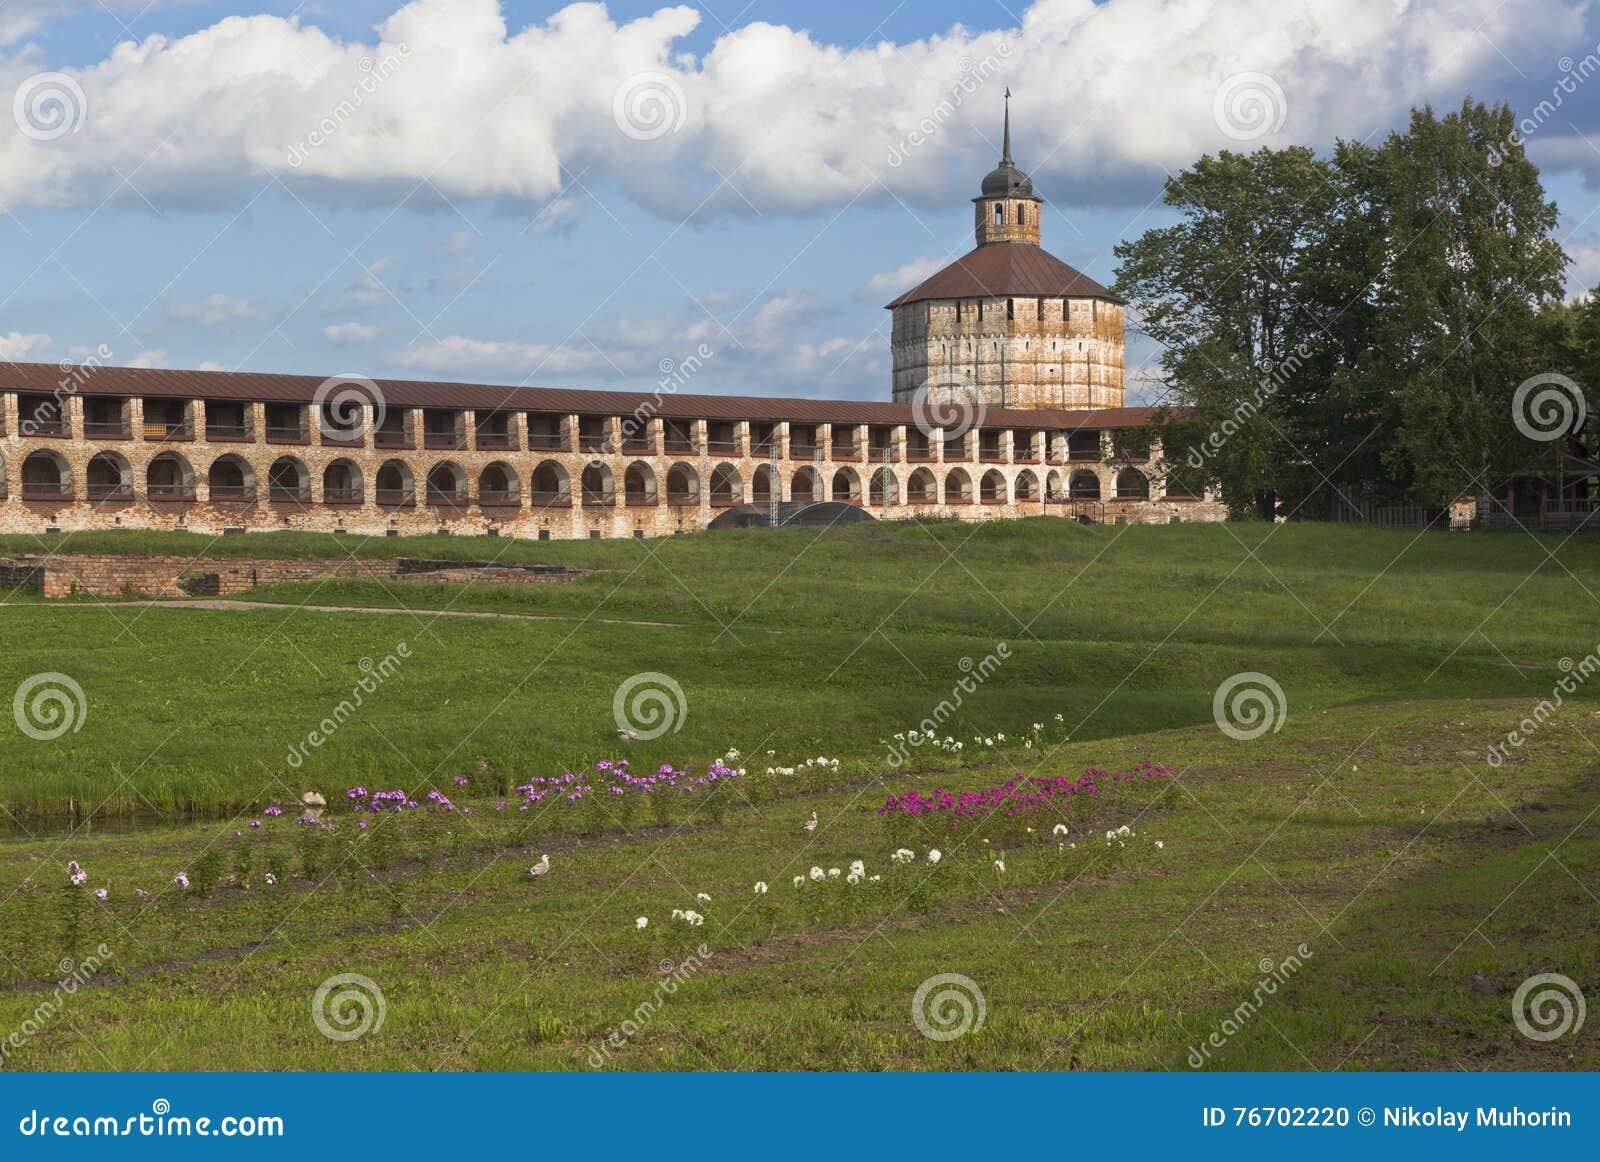 New fortress city and Vologda Tower of the Kirillo-Belozersky Monastery, Vologda region, Russia